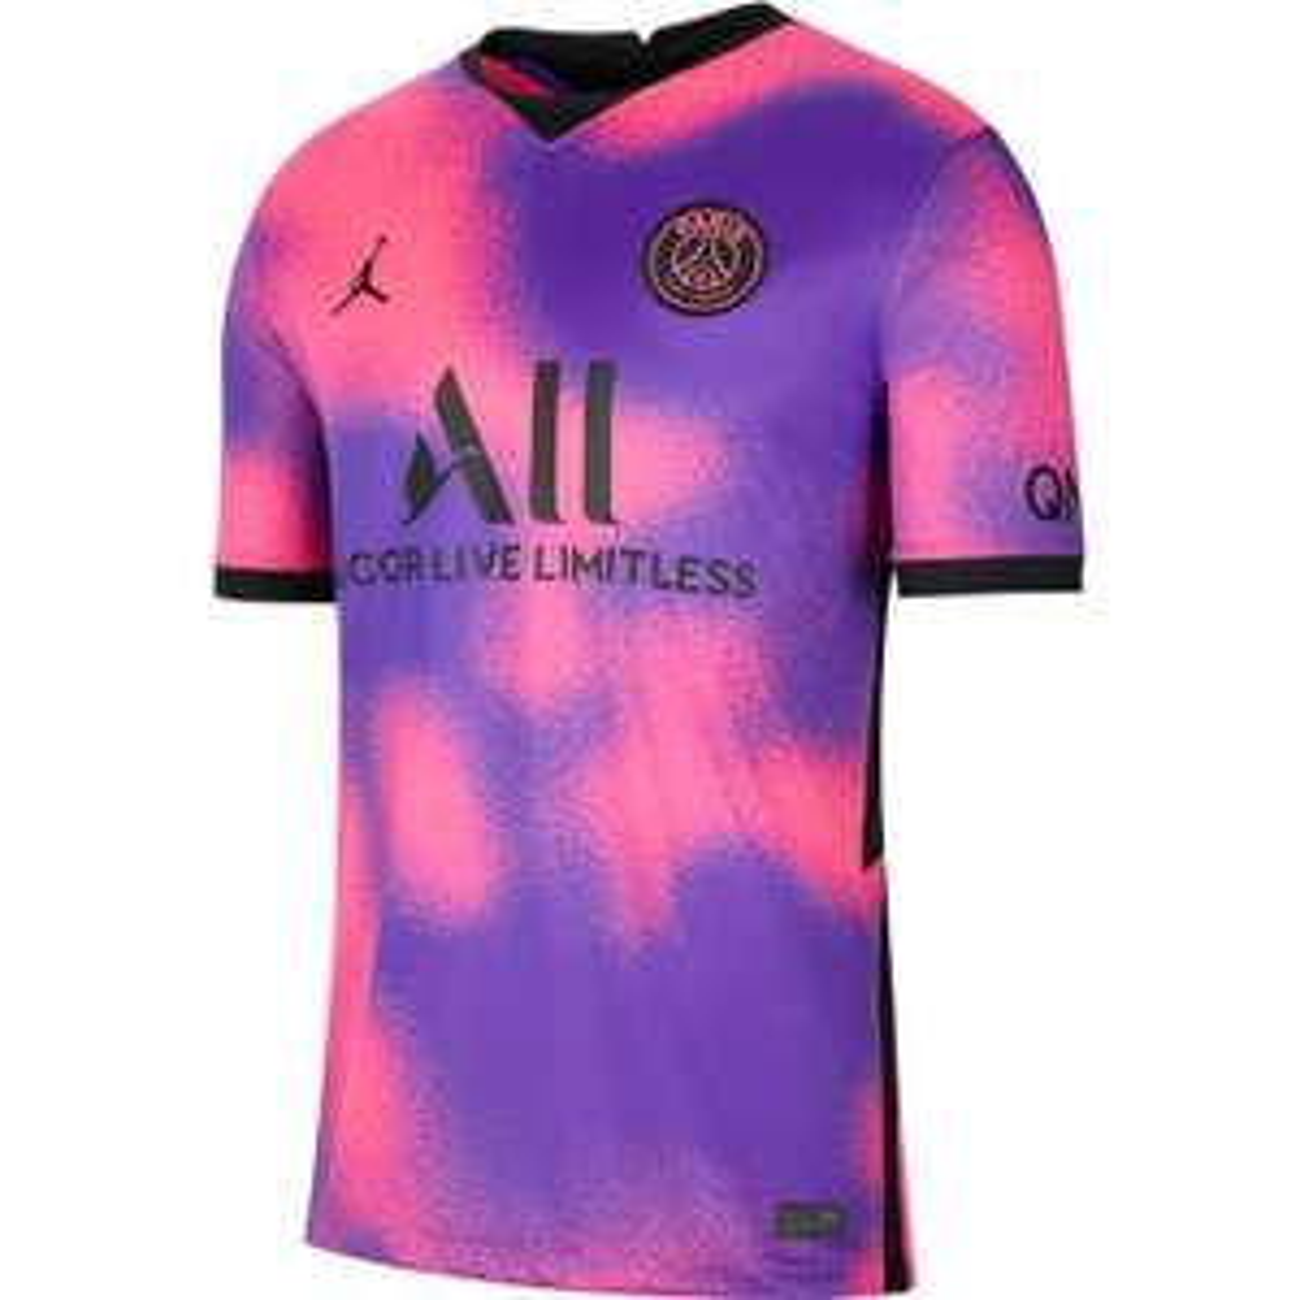 Maillot de football Nike PSG x Jordan 20/21 quatrième maillot - rose/violet (du S au XL)